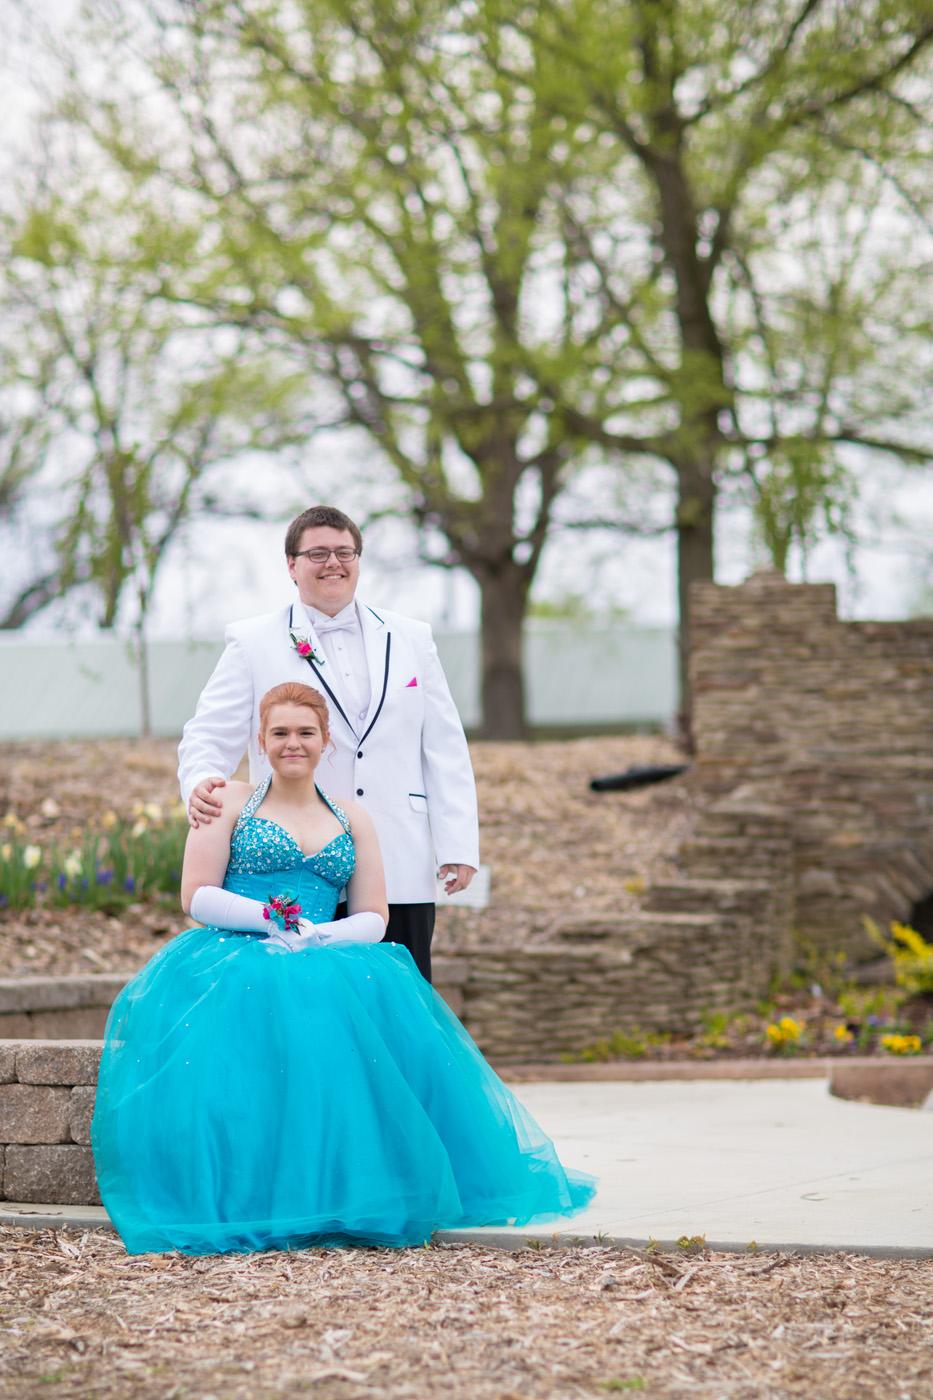 Garrett & Helen Prom 2014 174.jpg